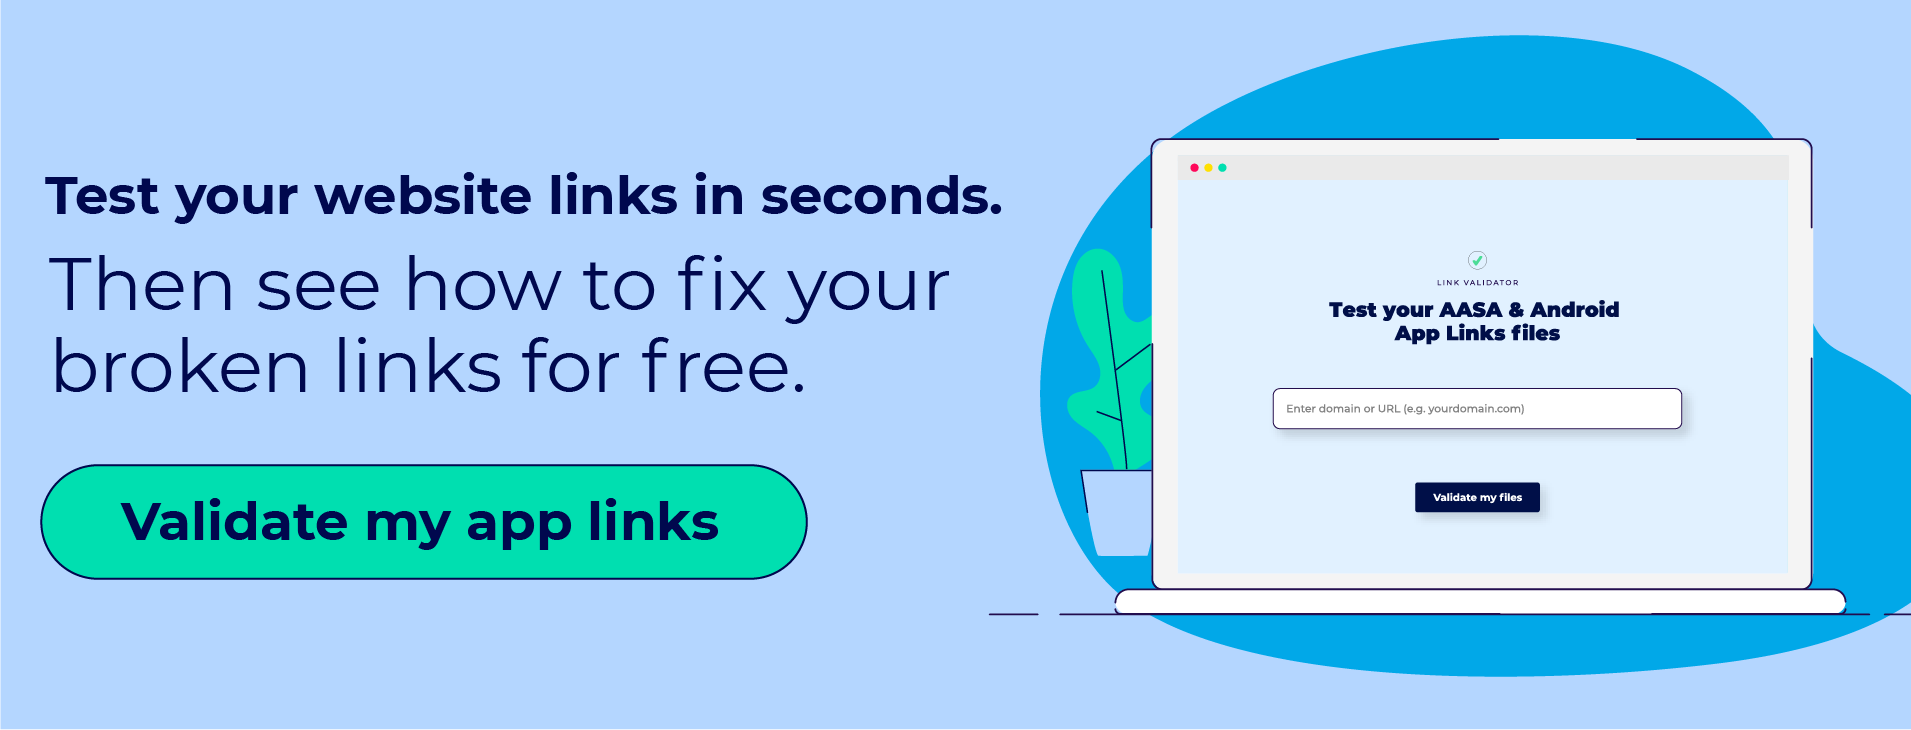 App links validator tool: test your website links in seconds